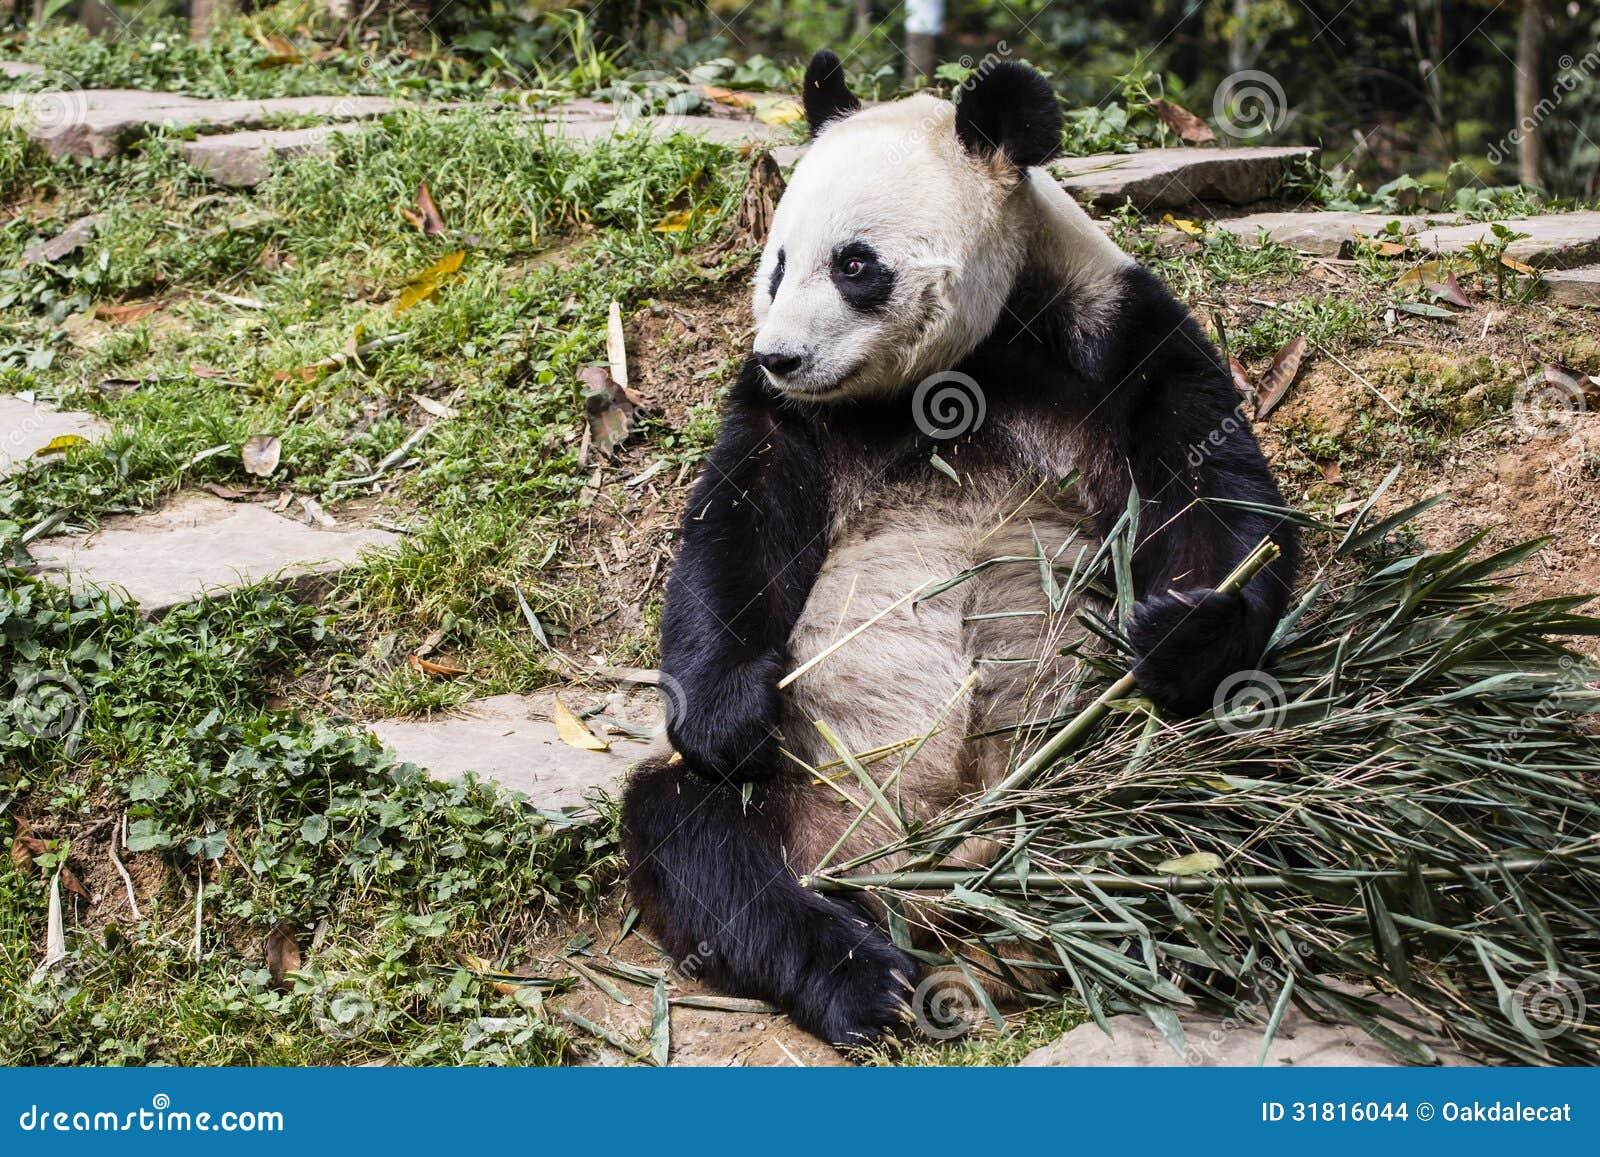 Big Panda, or Bamboo Bear: a description of where interesting facts live 31